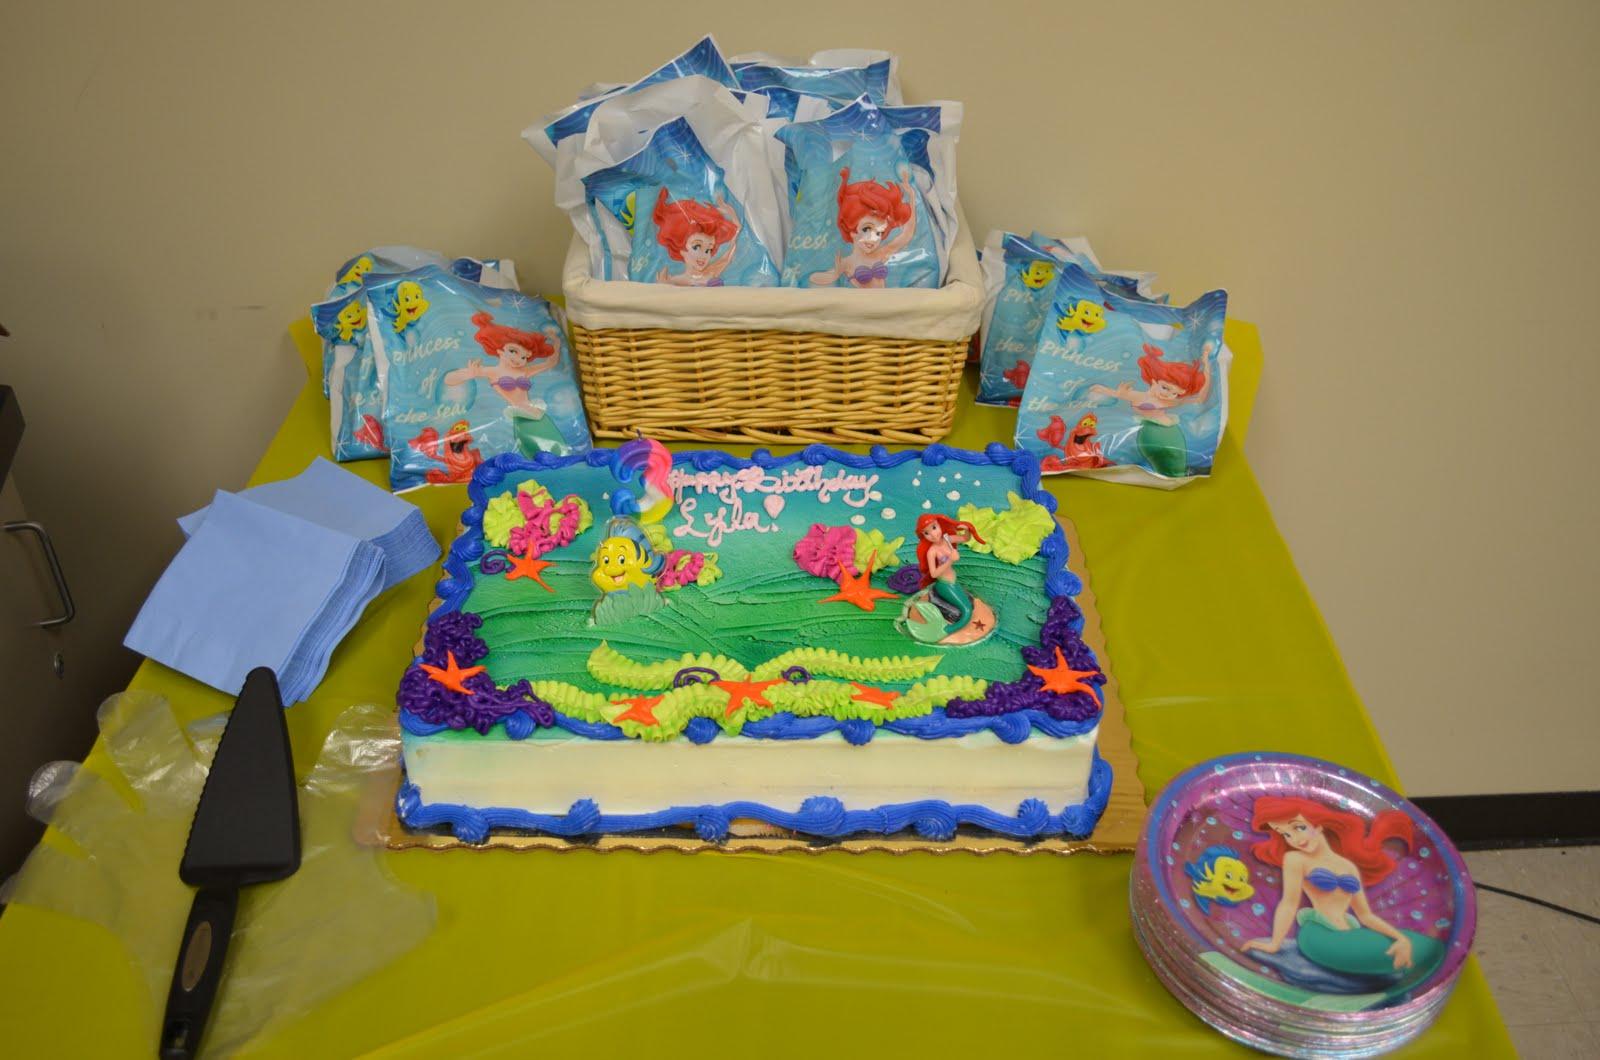 Kimtastic Momma lylas 3rd birthday party